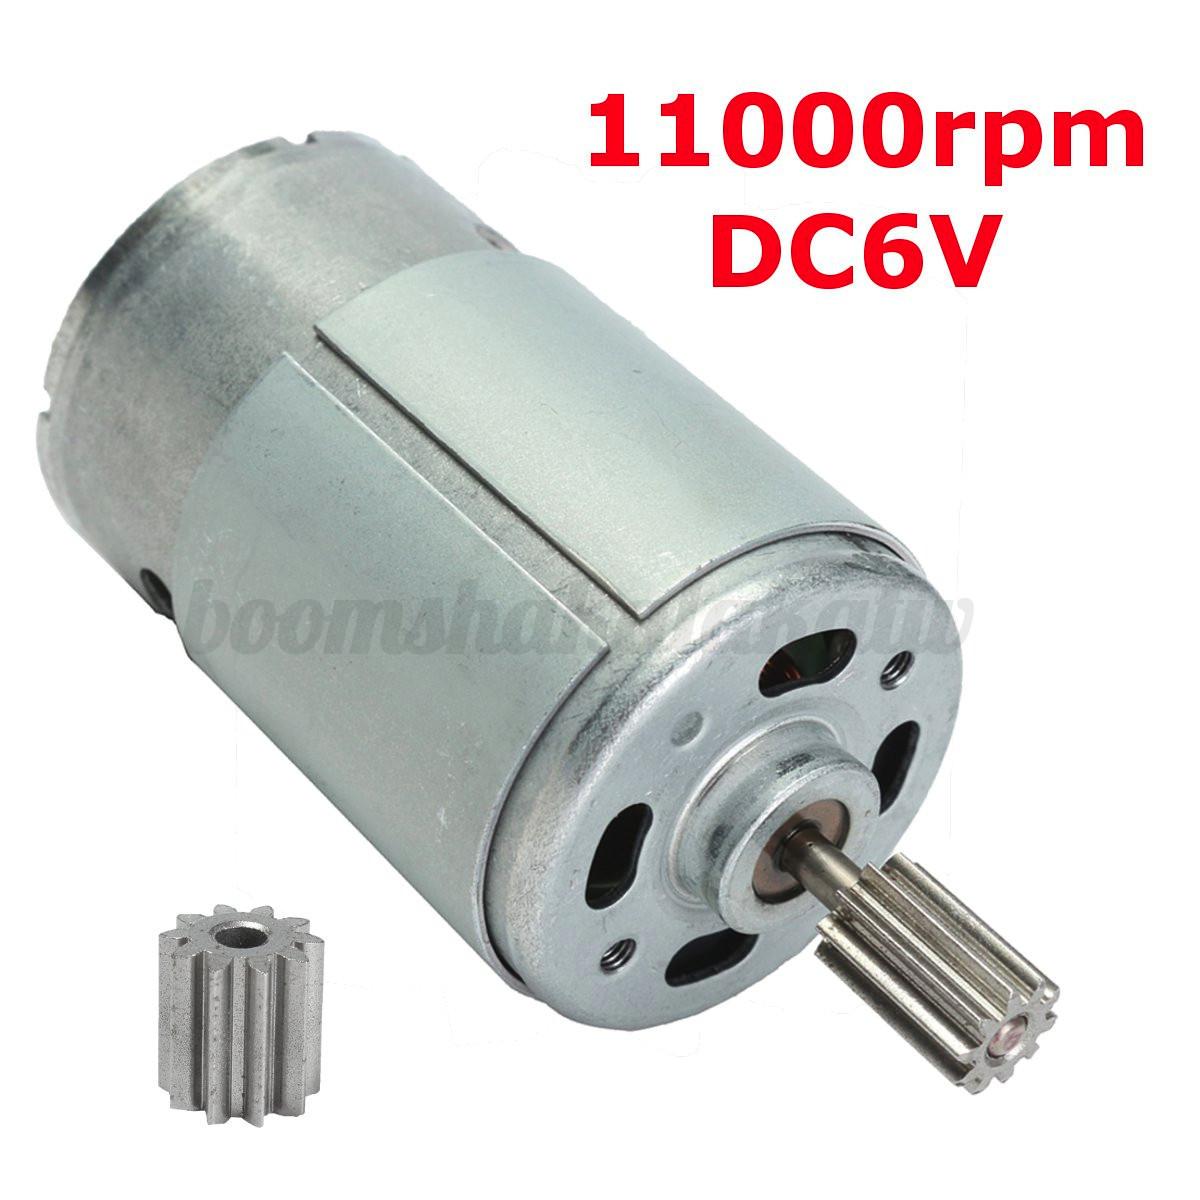 390 550 dc 6v 12v 18000 30000rpm electrical motor for kids for Dc gear motor 6v